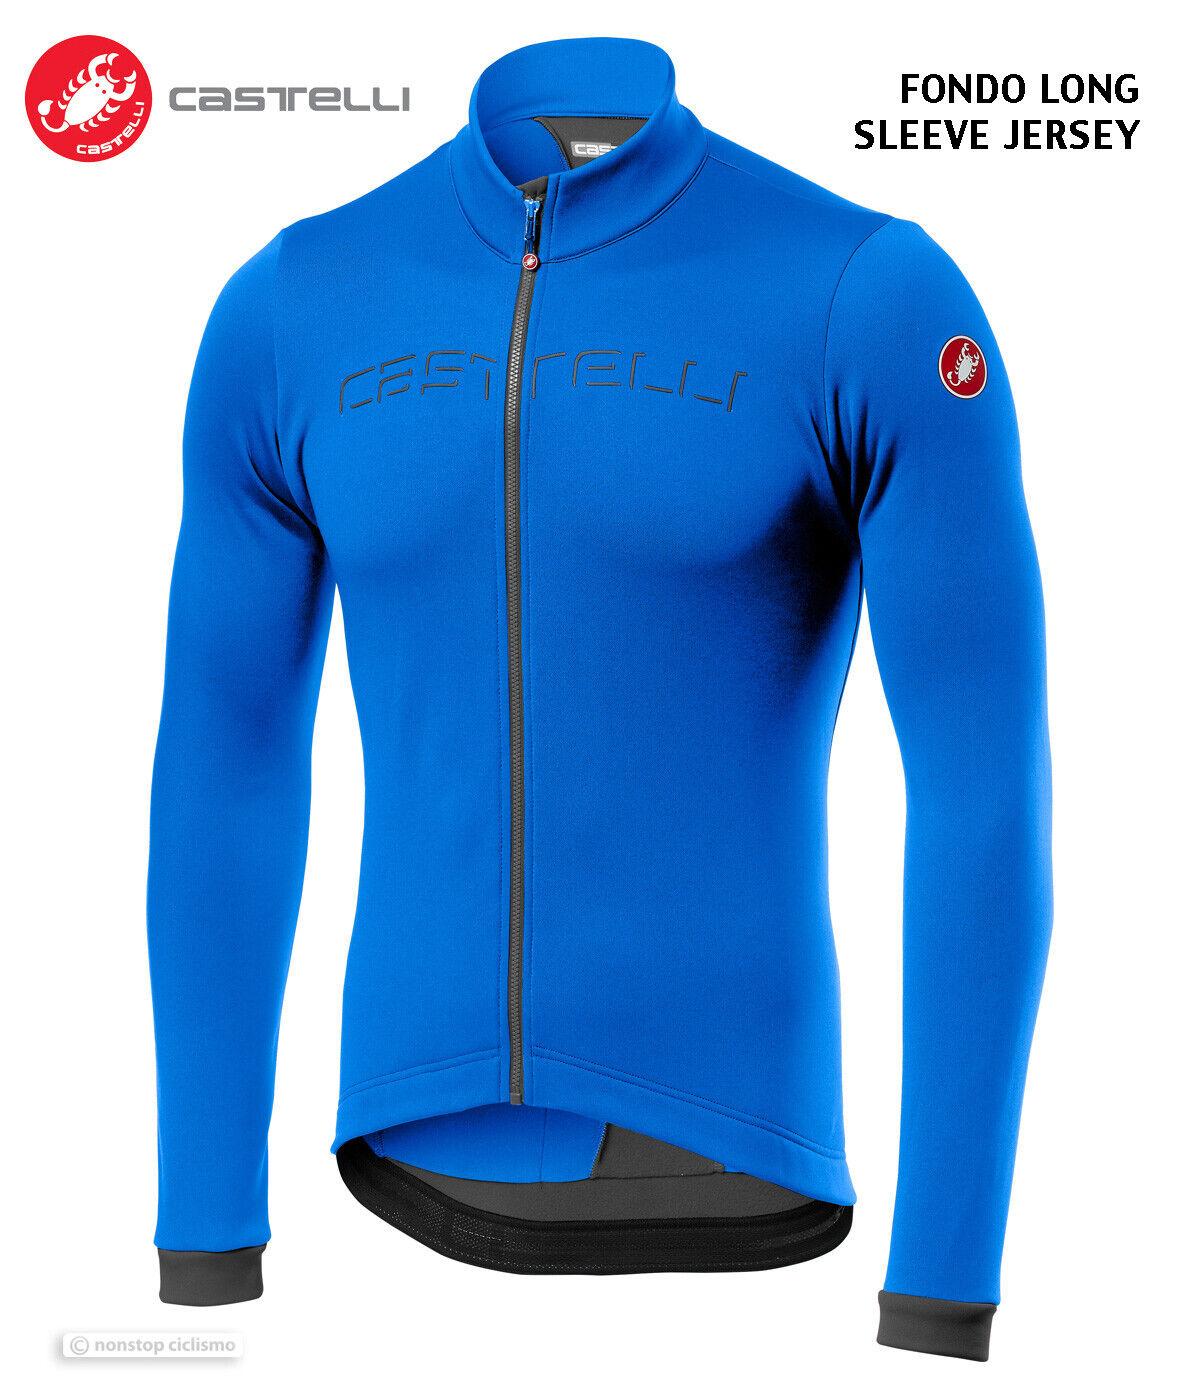 NEW Castelli FONDO Thermal Long Sleeve Cycling Jersey : DRIVE BLUE/DARK GREY